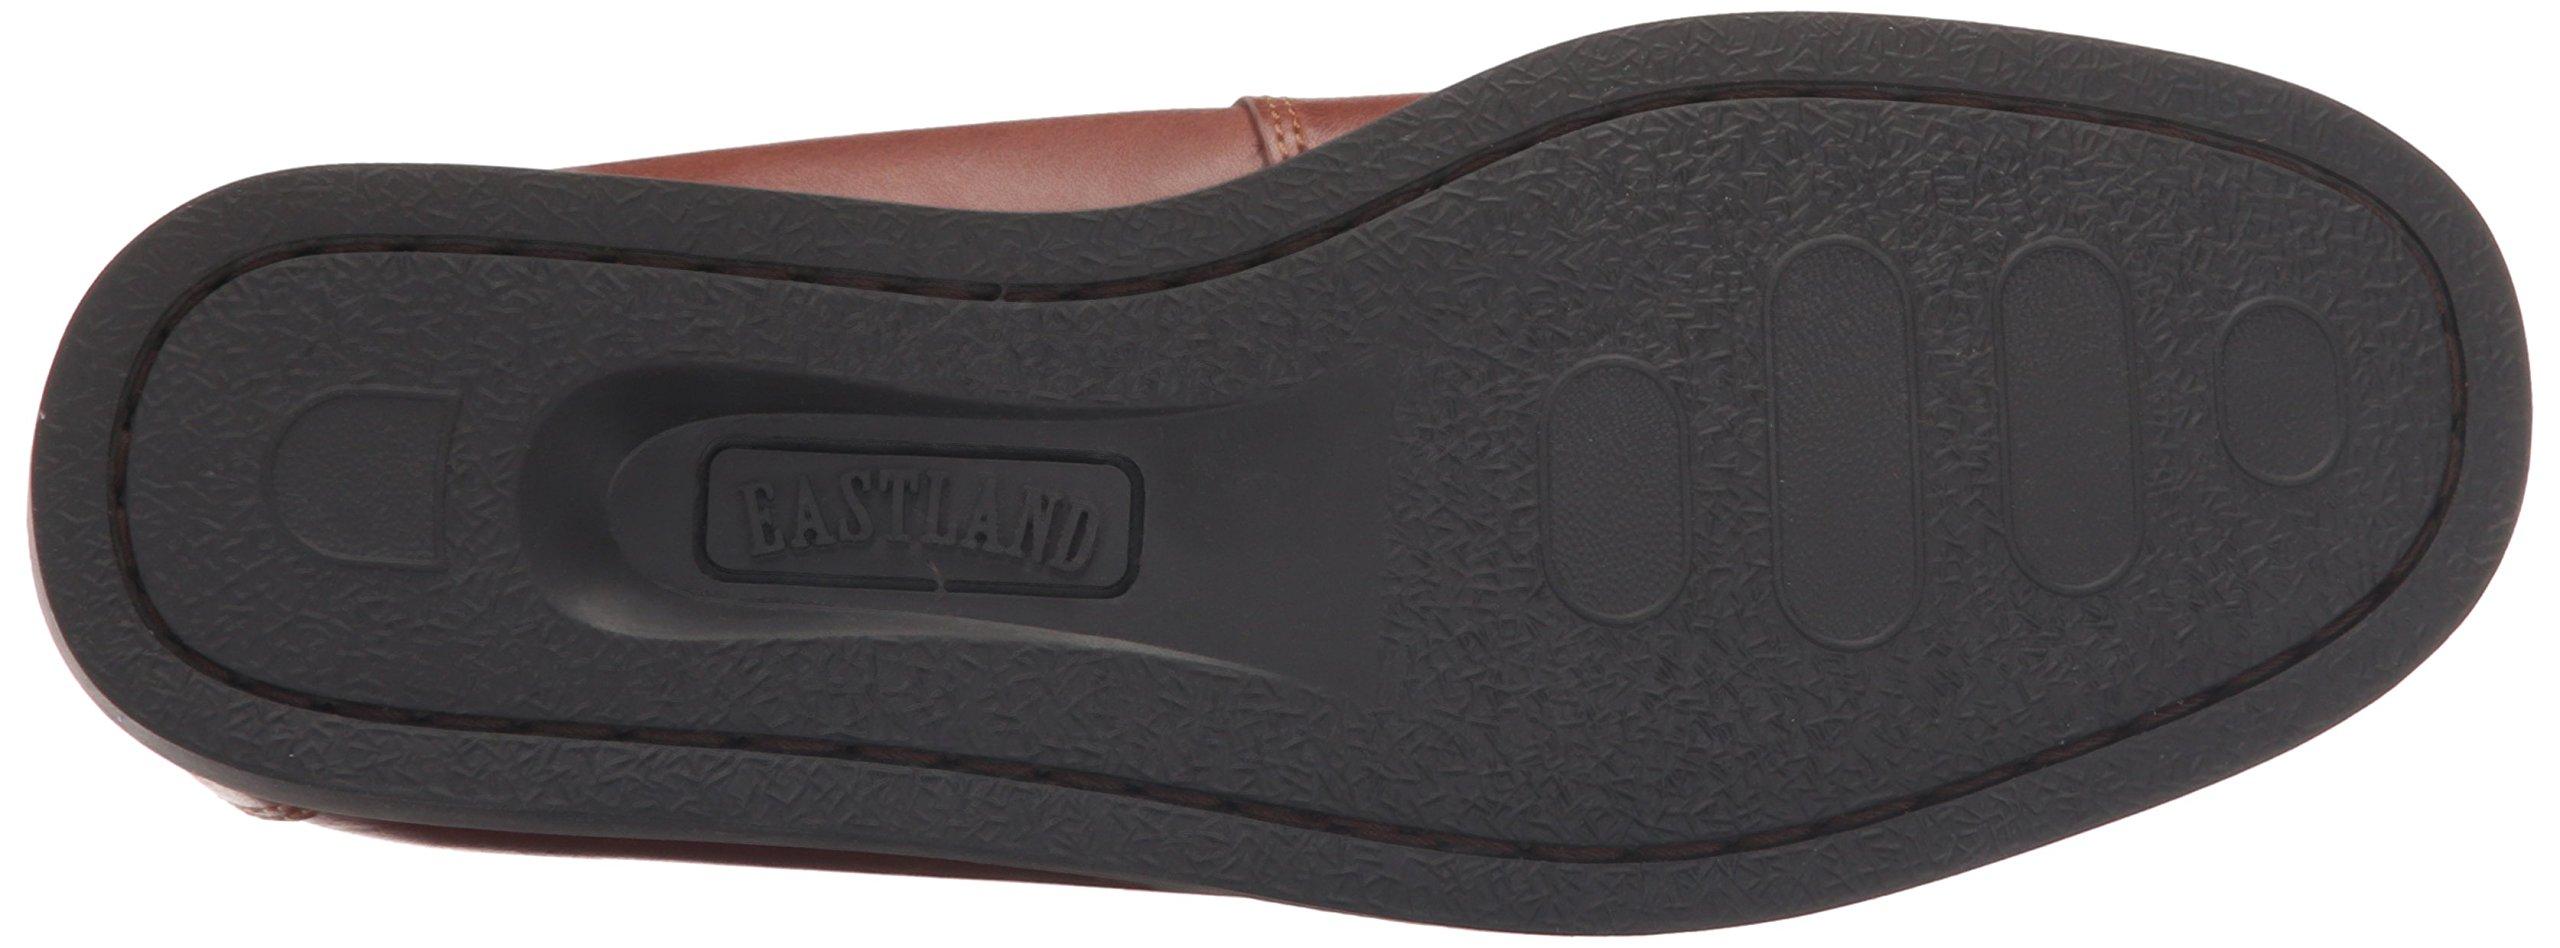 Eastland Men's Seneca Chukka Boot, Tan, 14 W US by Eastland (Image #3)